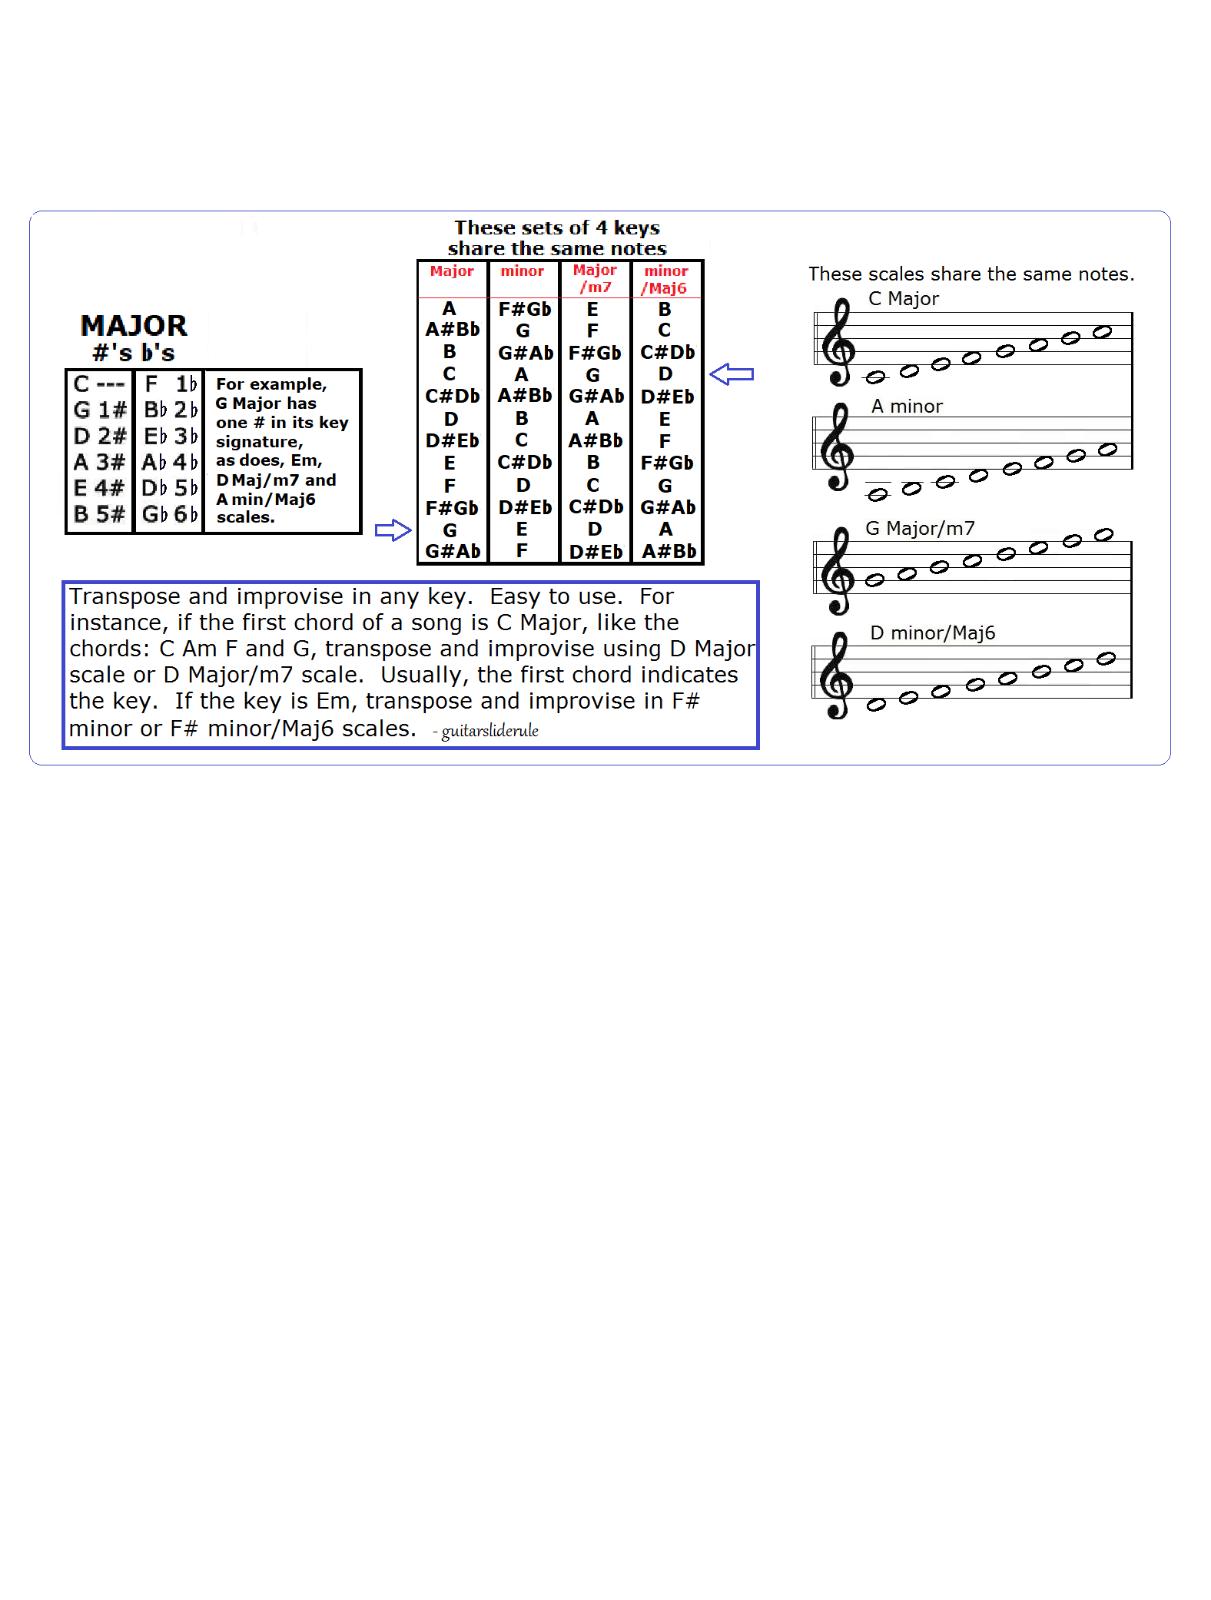 SLIDE TROMBONE CHART - 12 Scales - Improvise In Any Key